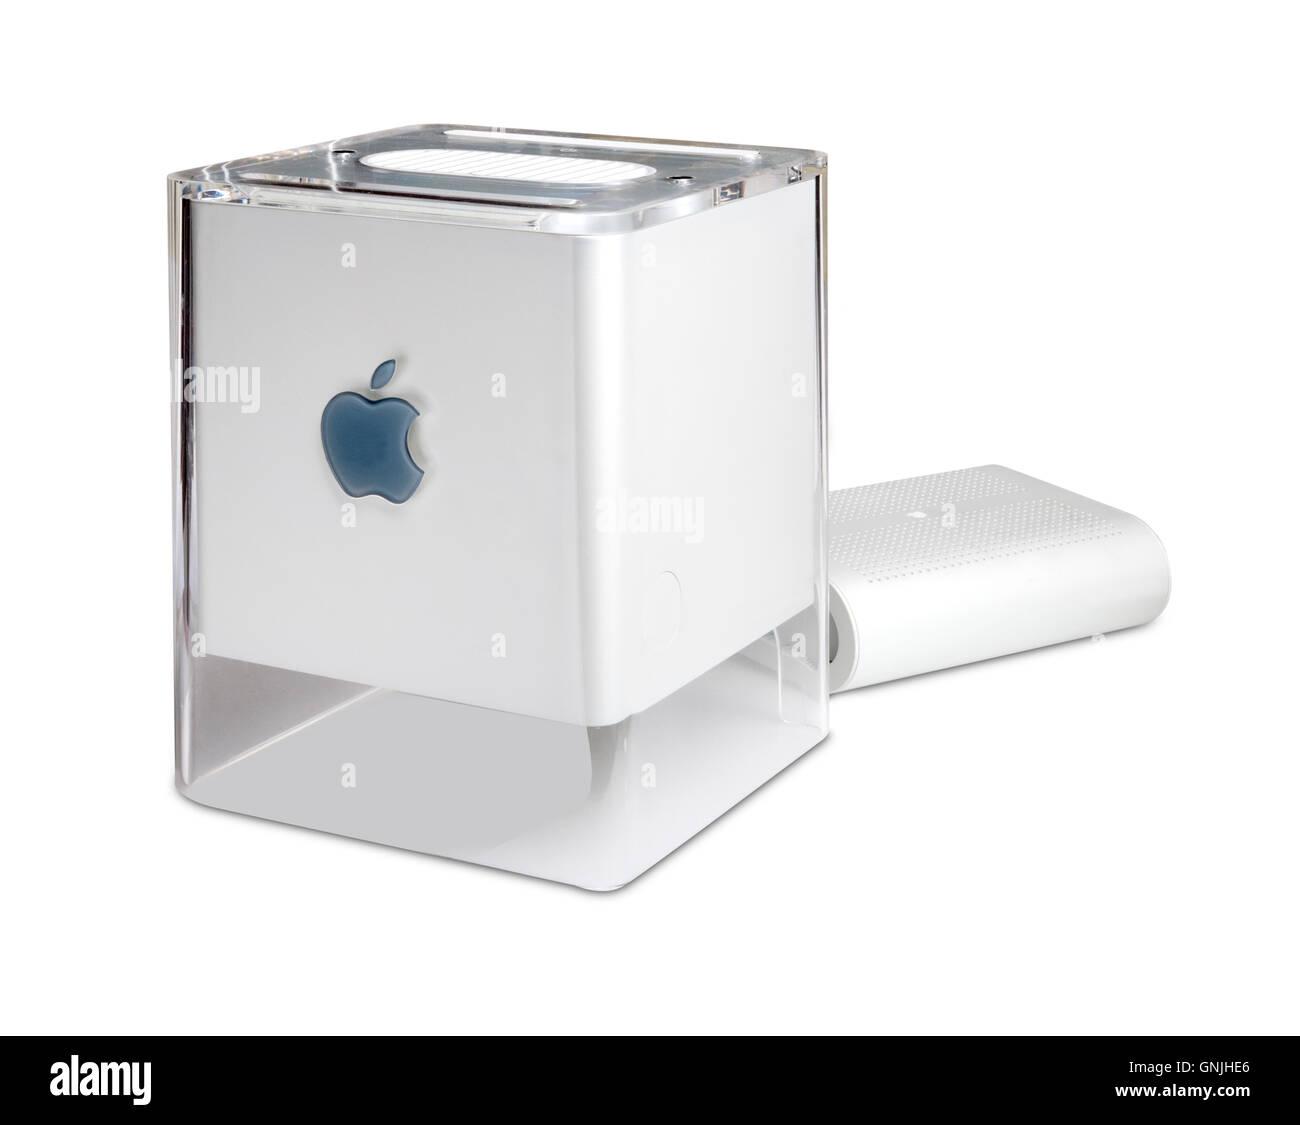 Apple Mac G4 Cube Computer - Stock Image